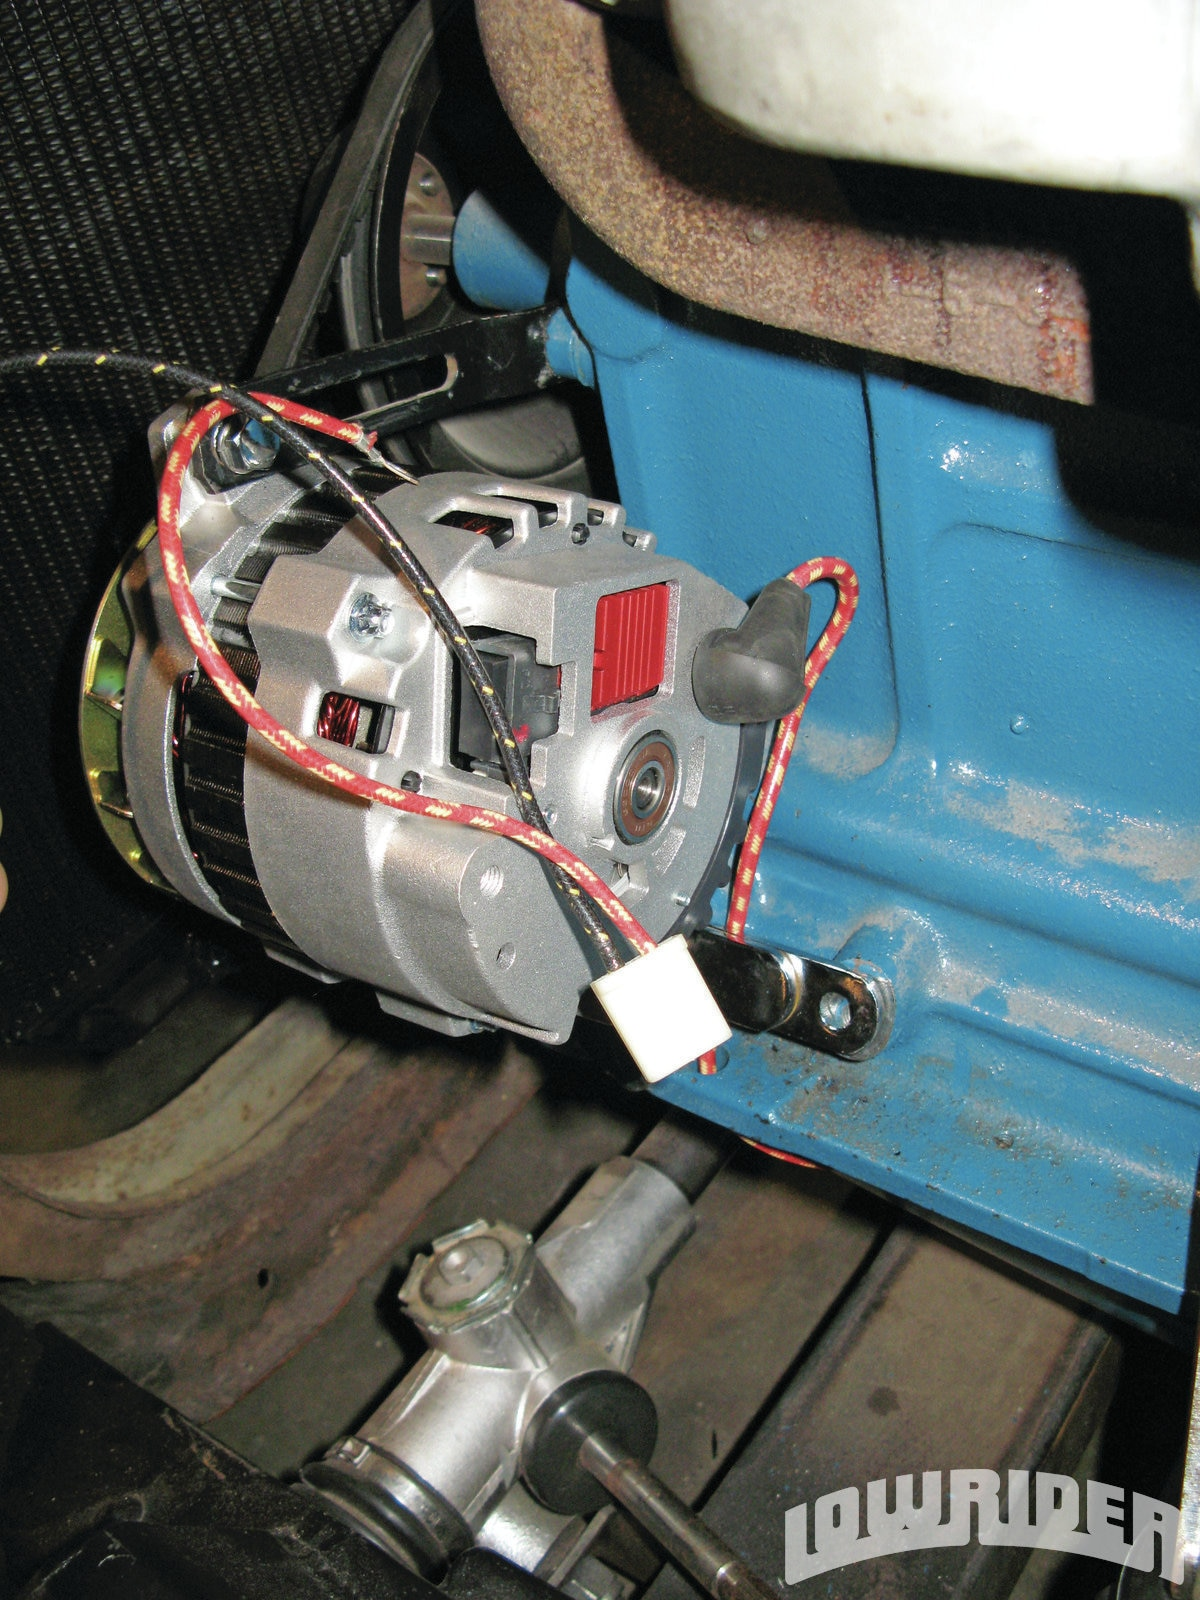 American Autowire Highway 15 Nostalgia Wiring Kit - Lowrider Magazine